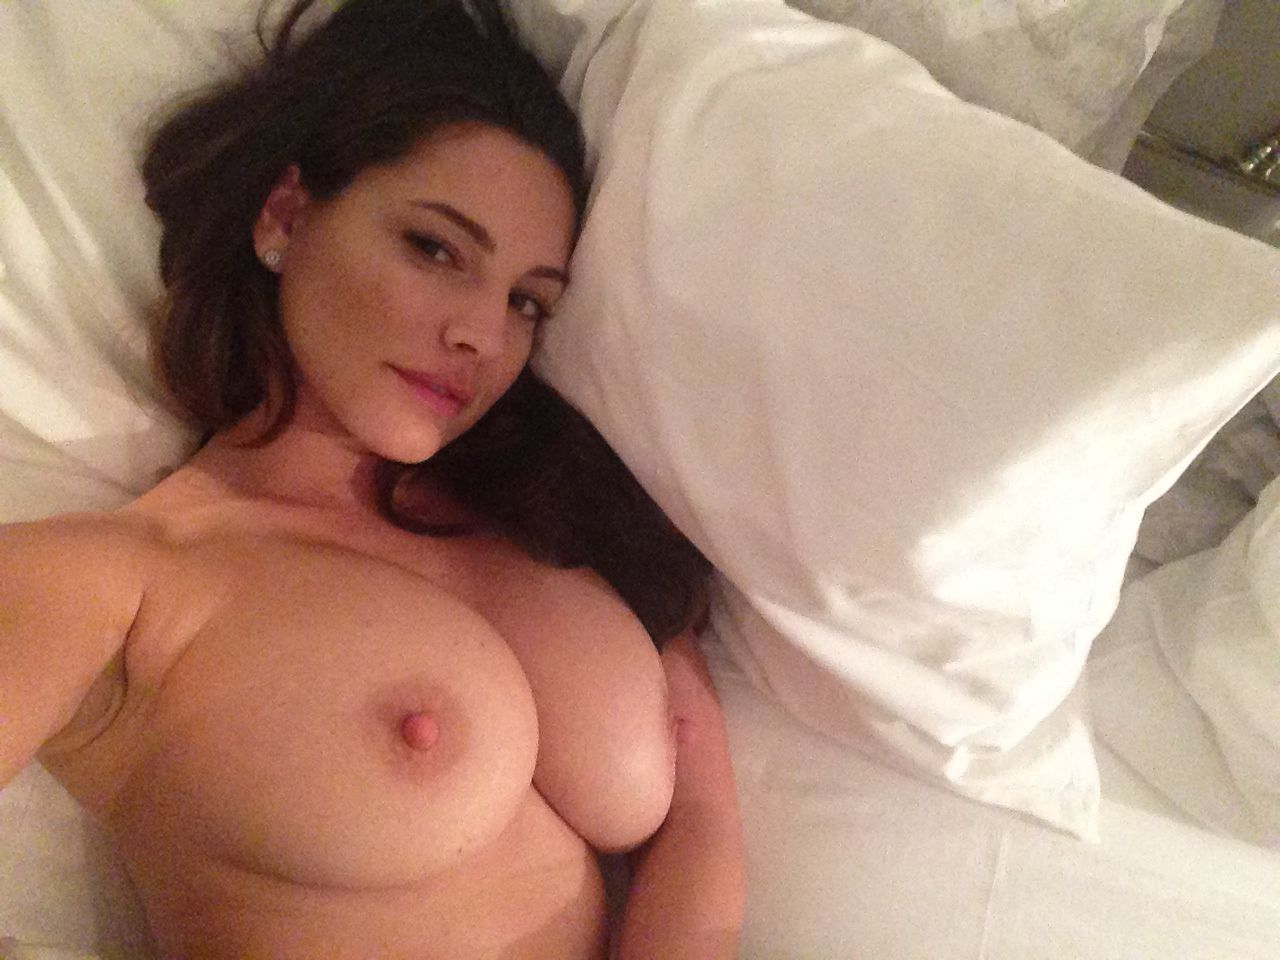 Nude Pics Of Dana Brooke